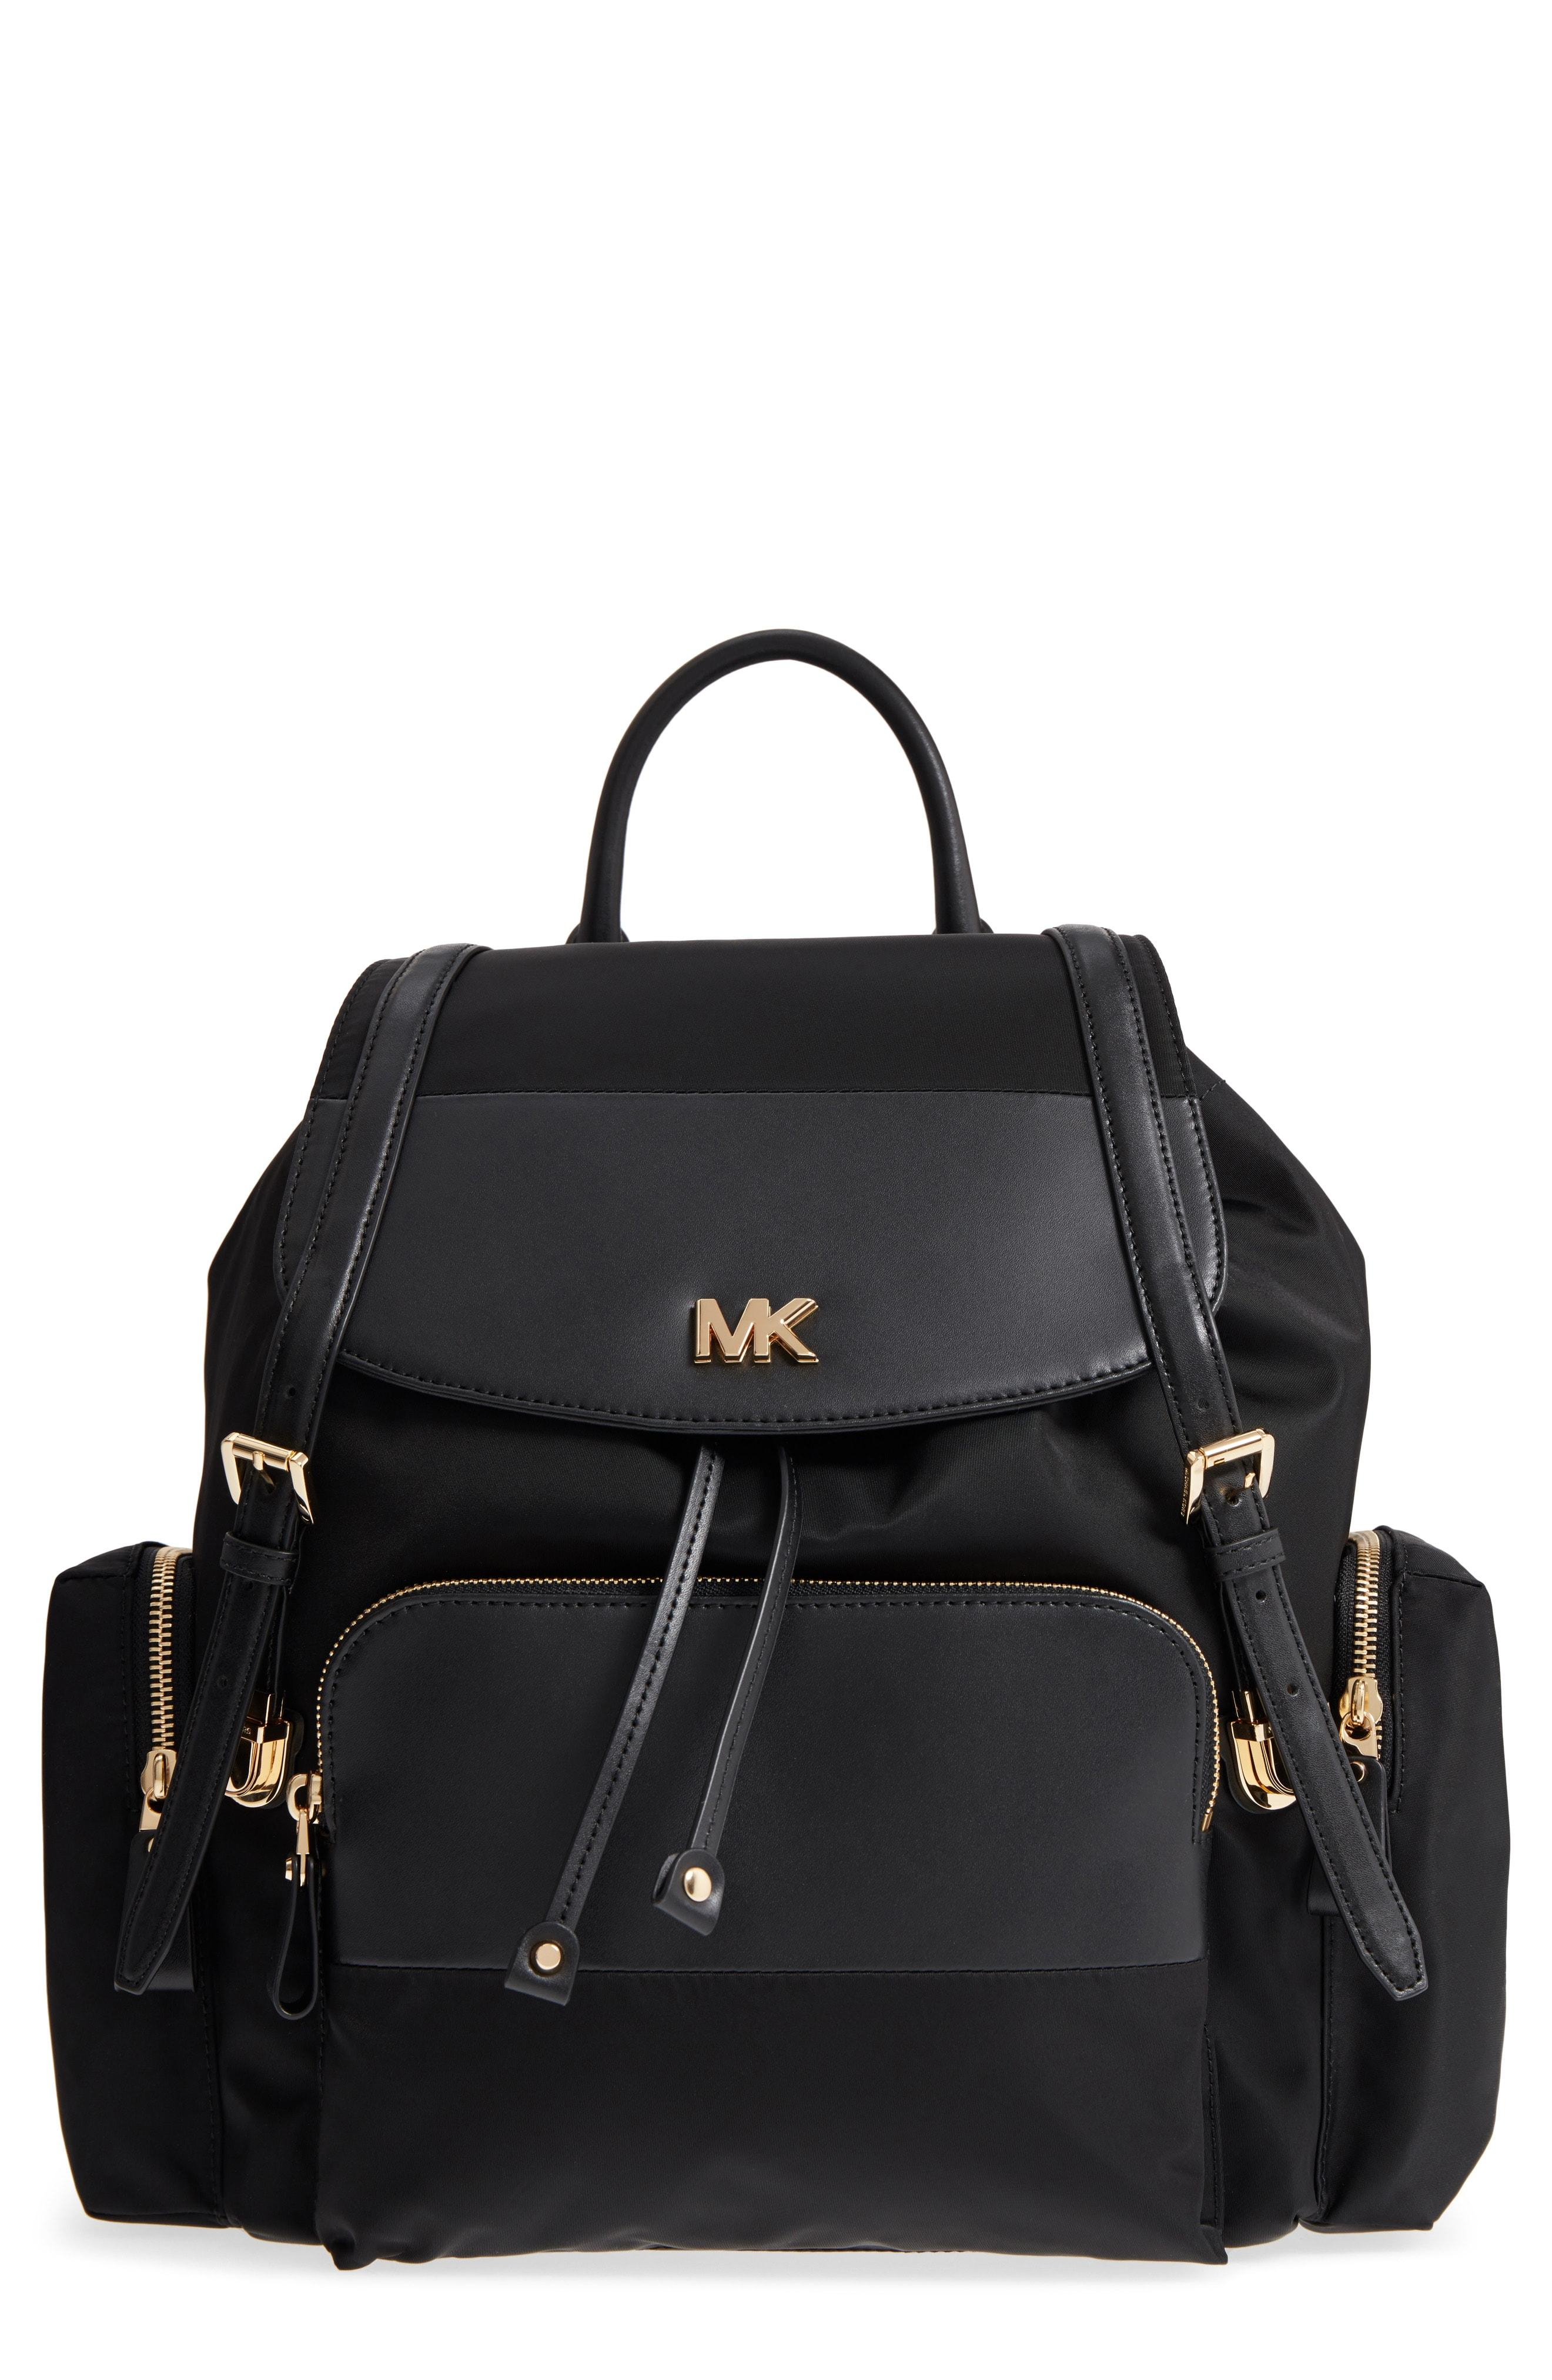 ad321bc920e5 Lyst - MICHAEL Michael Kors Large Nylon Diaper Backpack - in Black